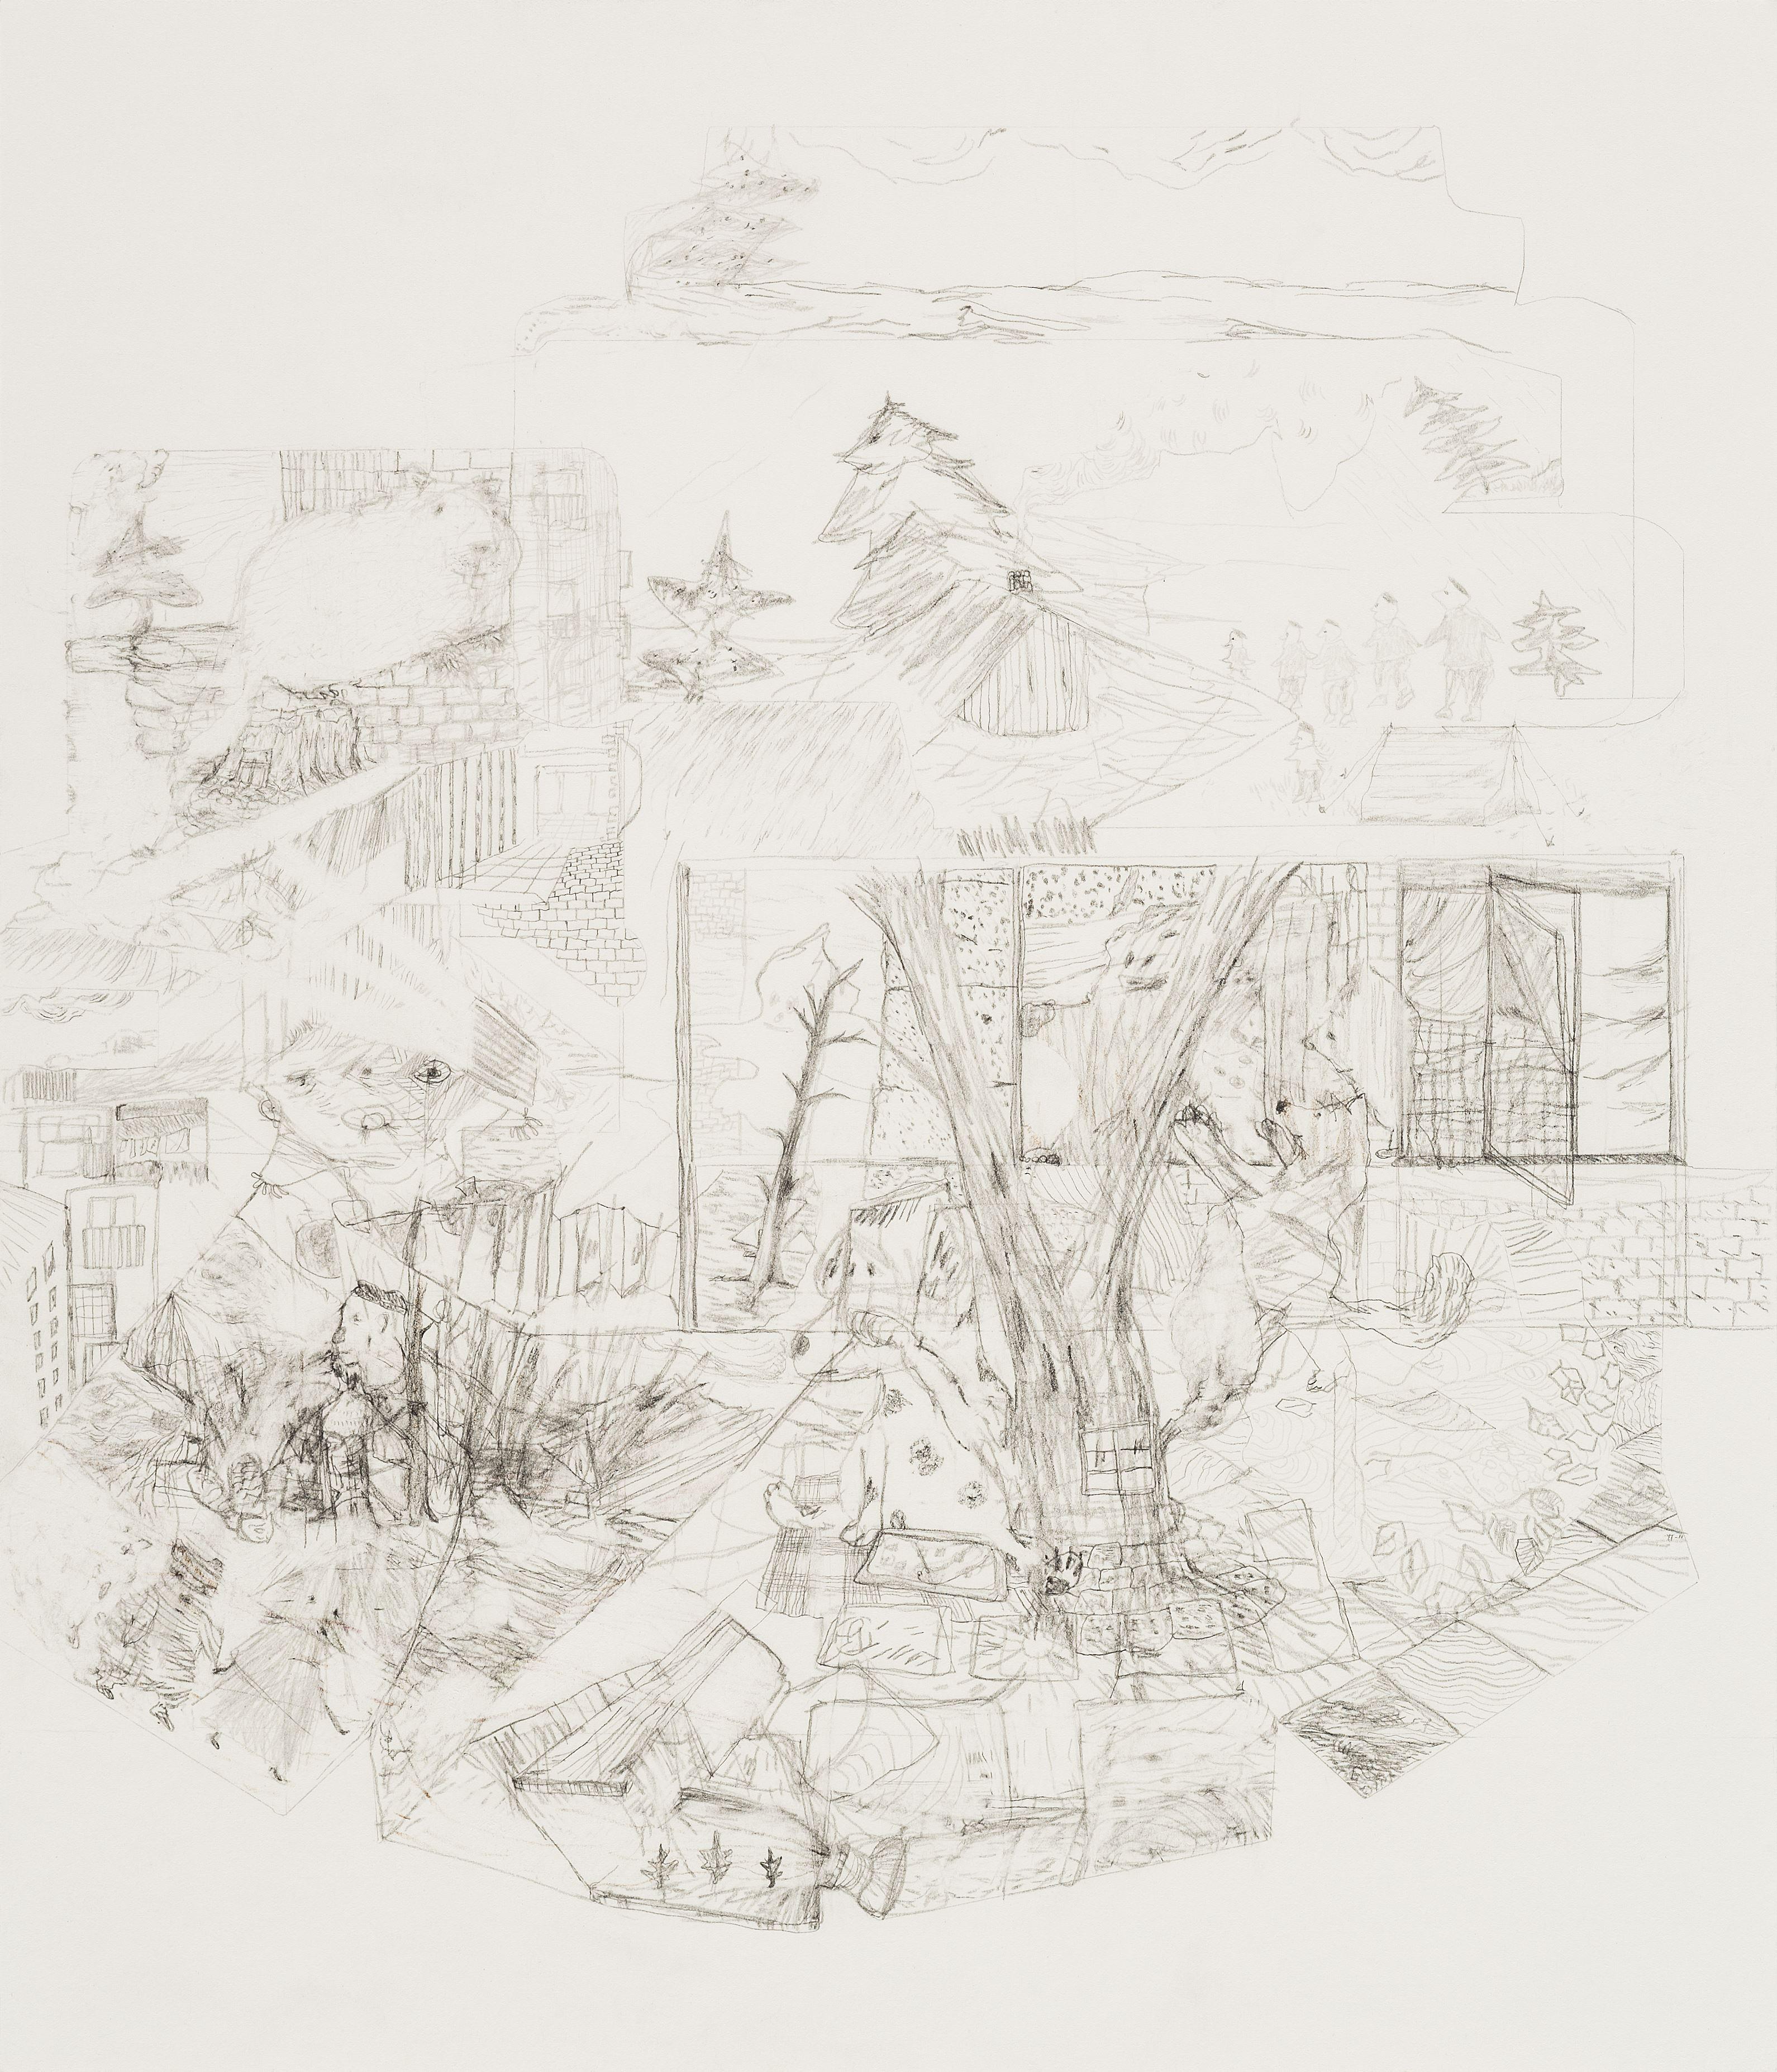 Nils Agdler,  © Bild: Tobias Törnqvist, Tobias Törnqvist - Drawings & collage at Ahlbergshallen